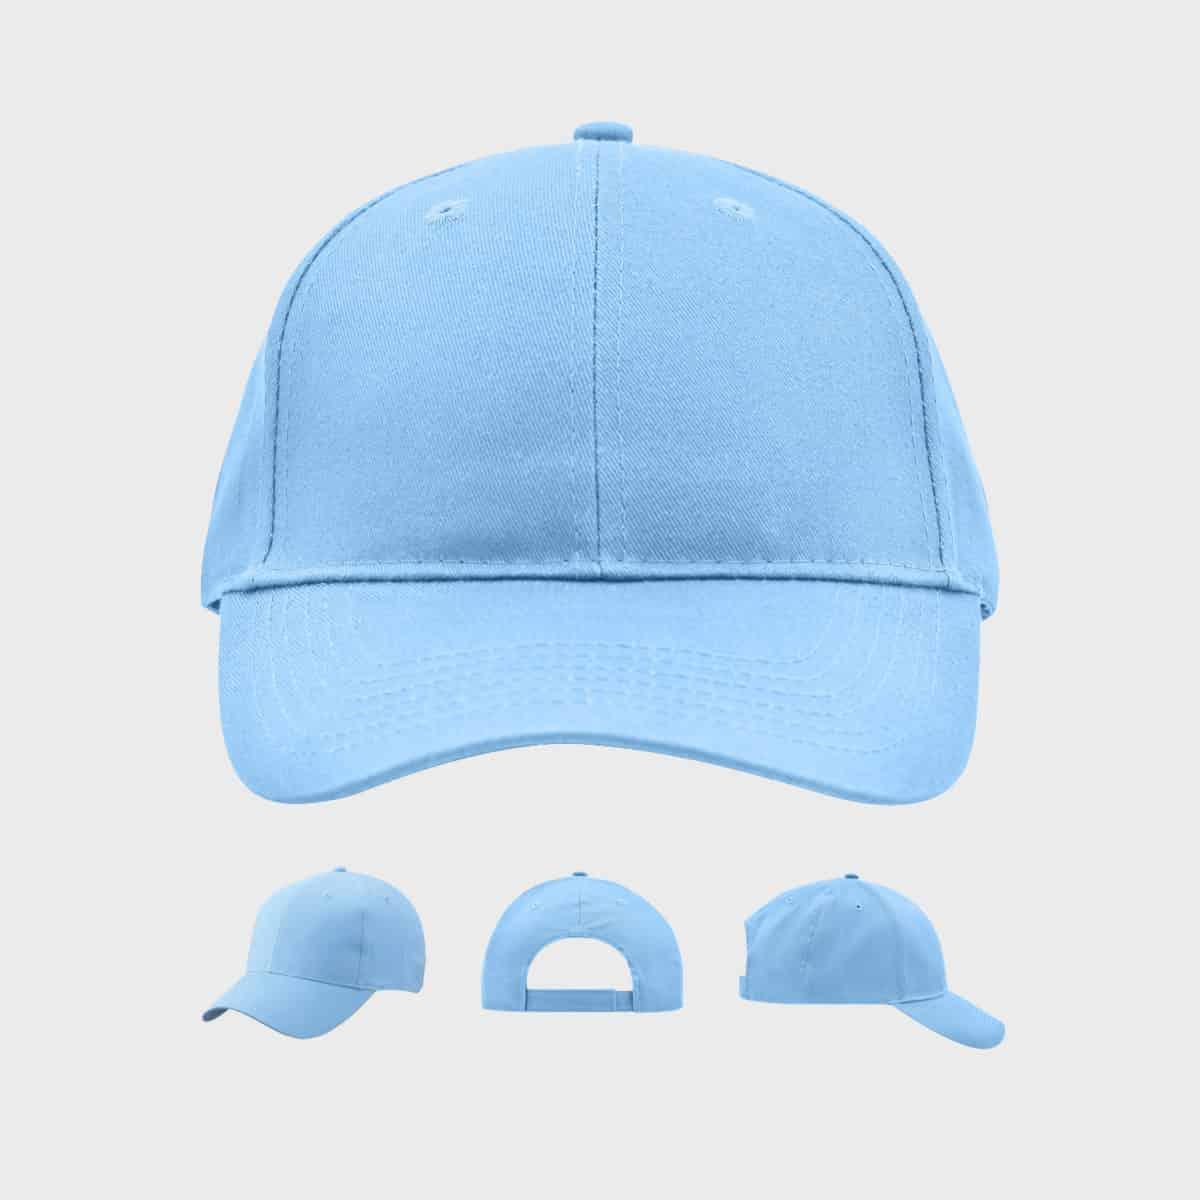 brushed-6-panel-baseball-cap-light-blue-kaufen-besticken_stickmanufaktur